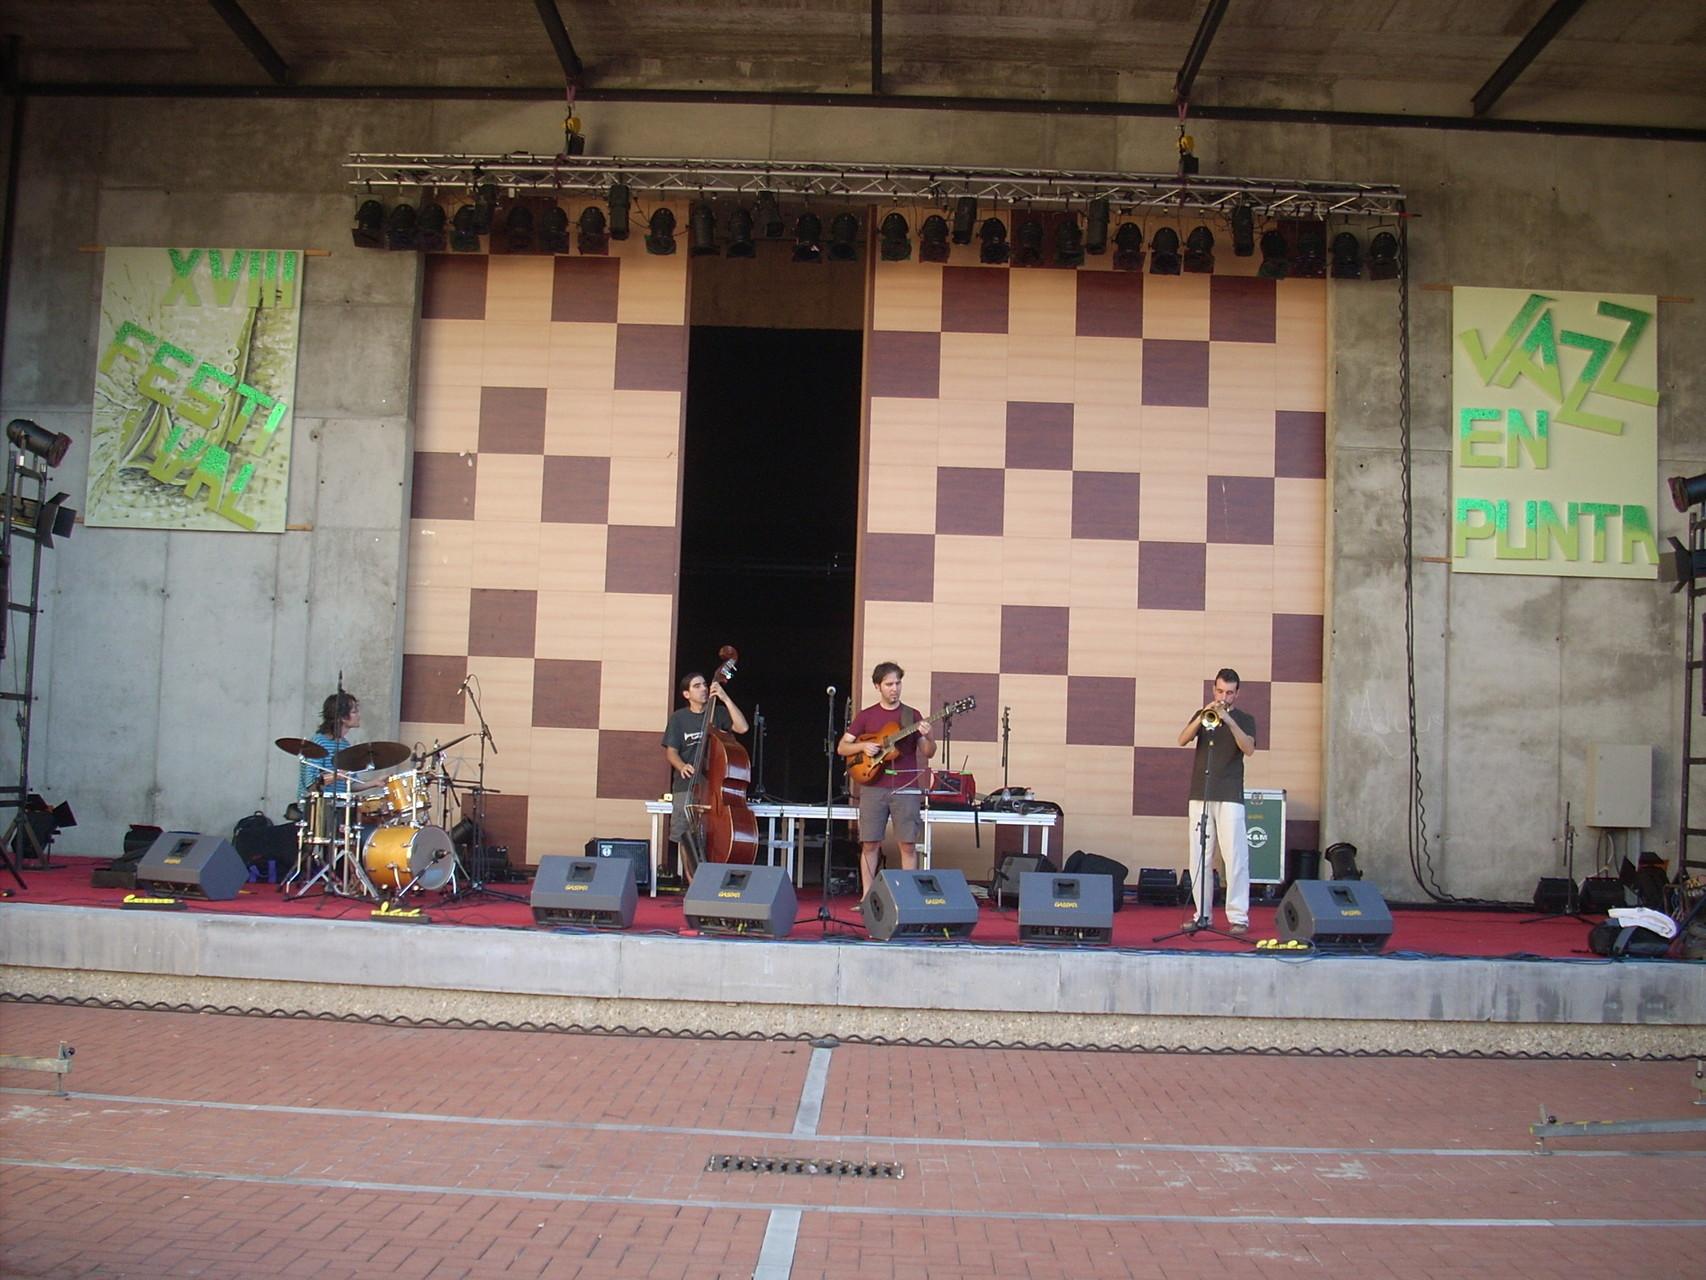 QUINTETO. FESTIVAL JAZZ EN PUNTA. PUNTA UMBRÍA. HUELVA. AGOSTO 2009